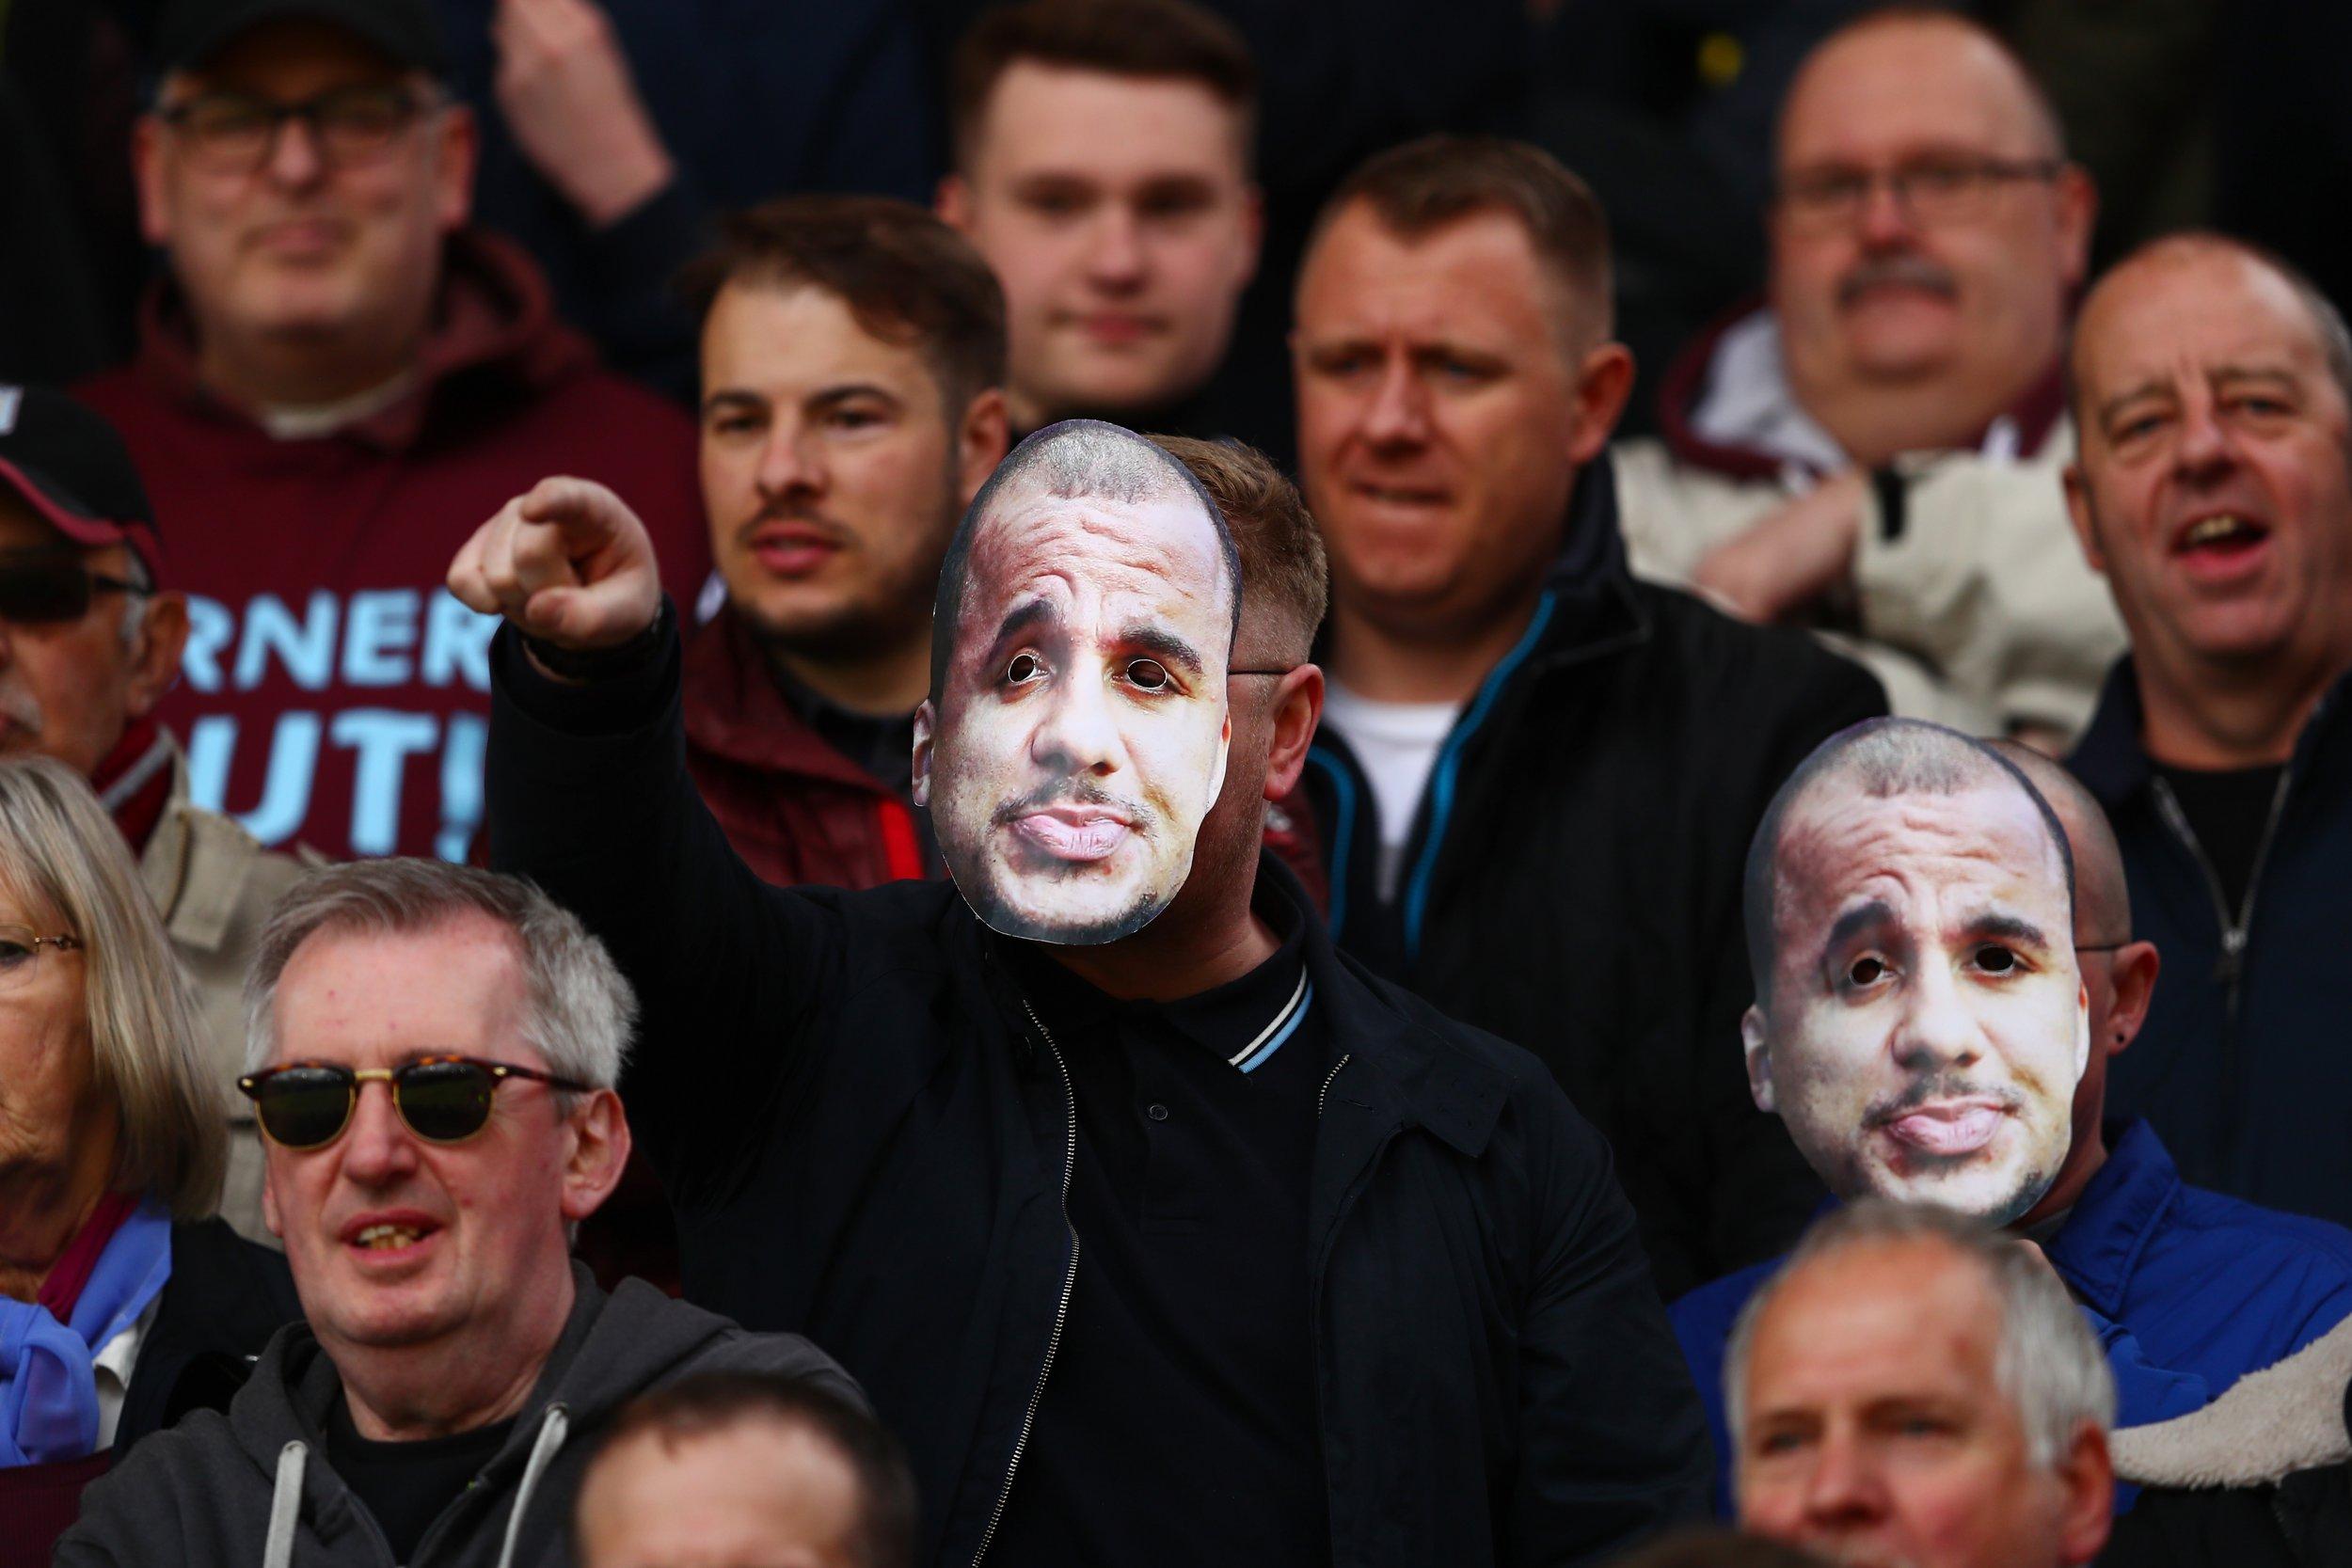 Aston Villa fans wearing Gabriel Agbonlahor masks.